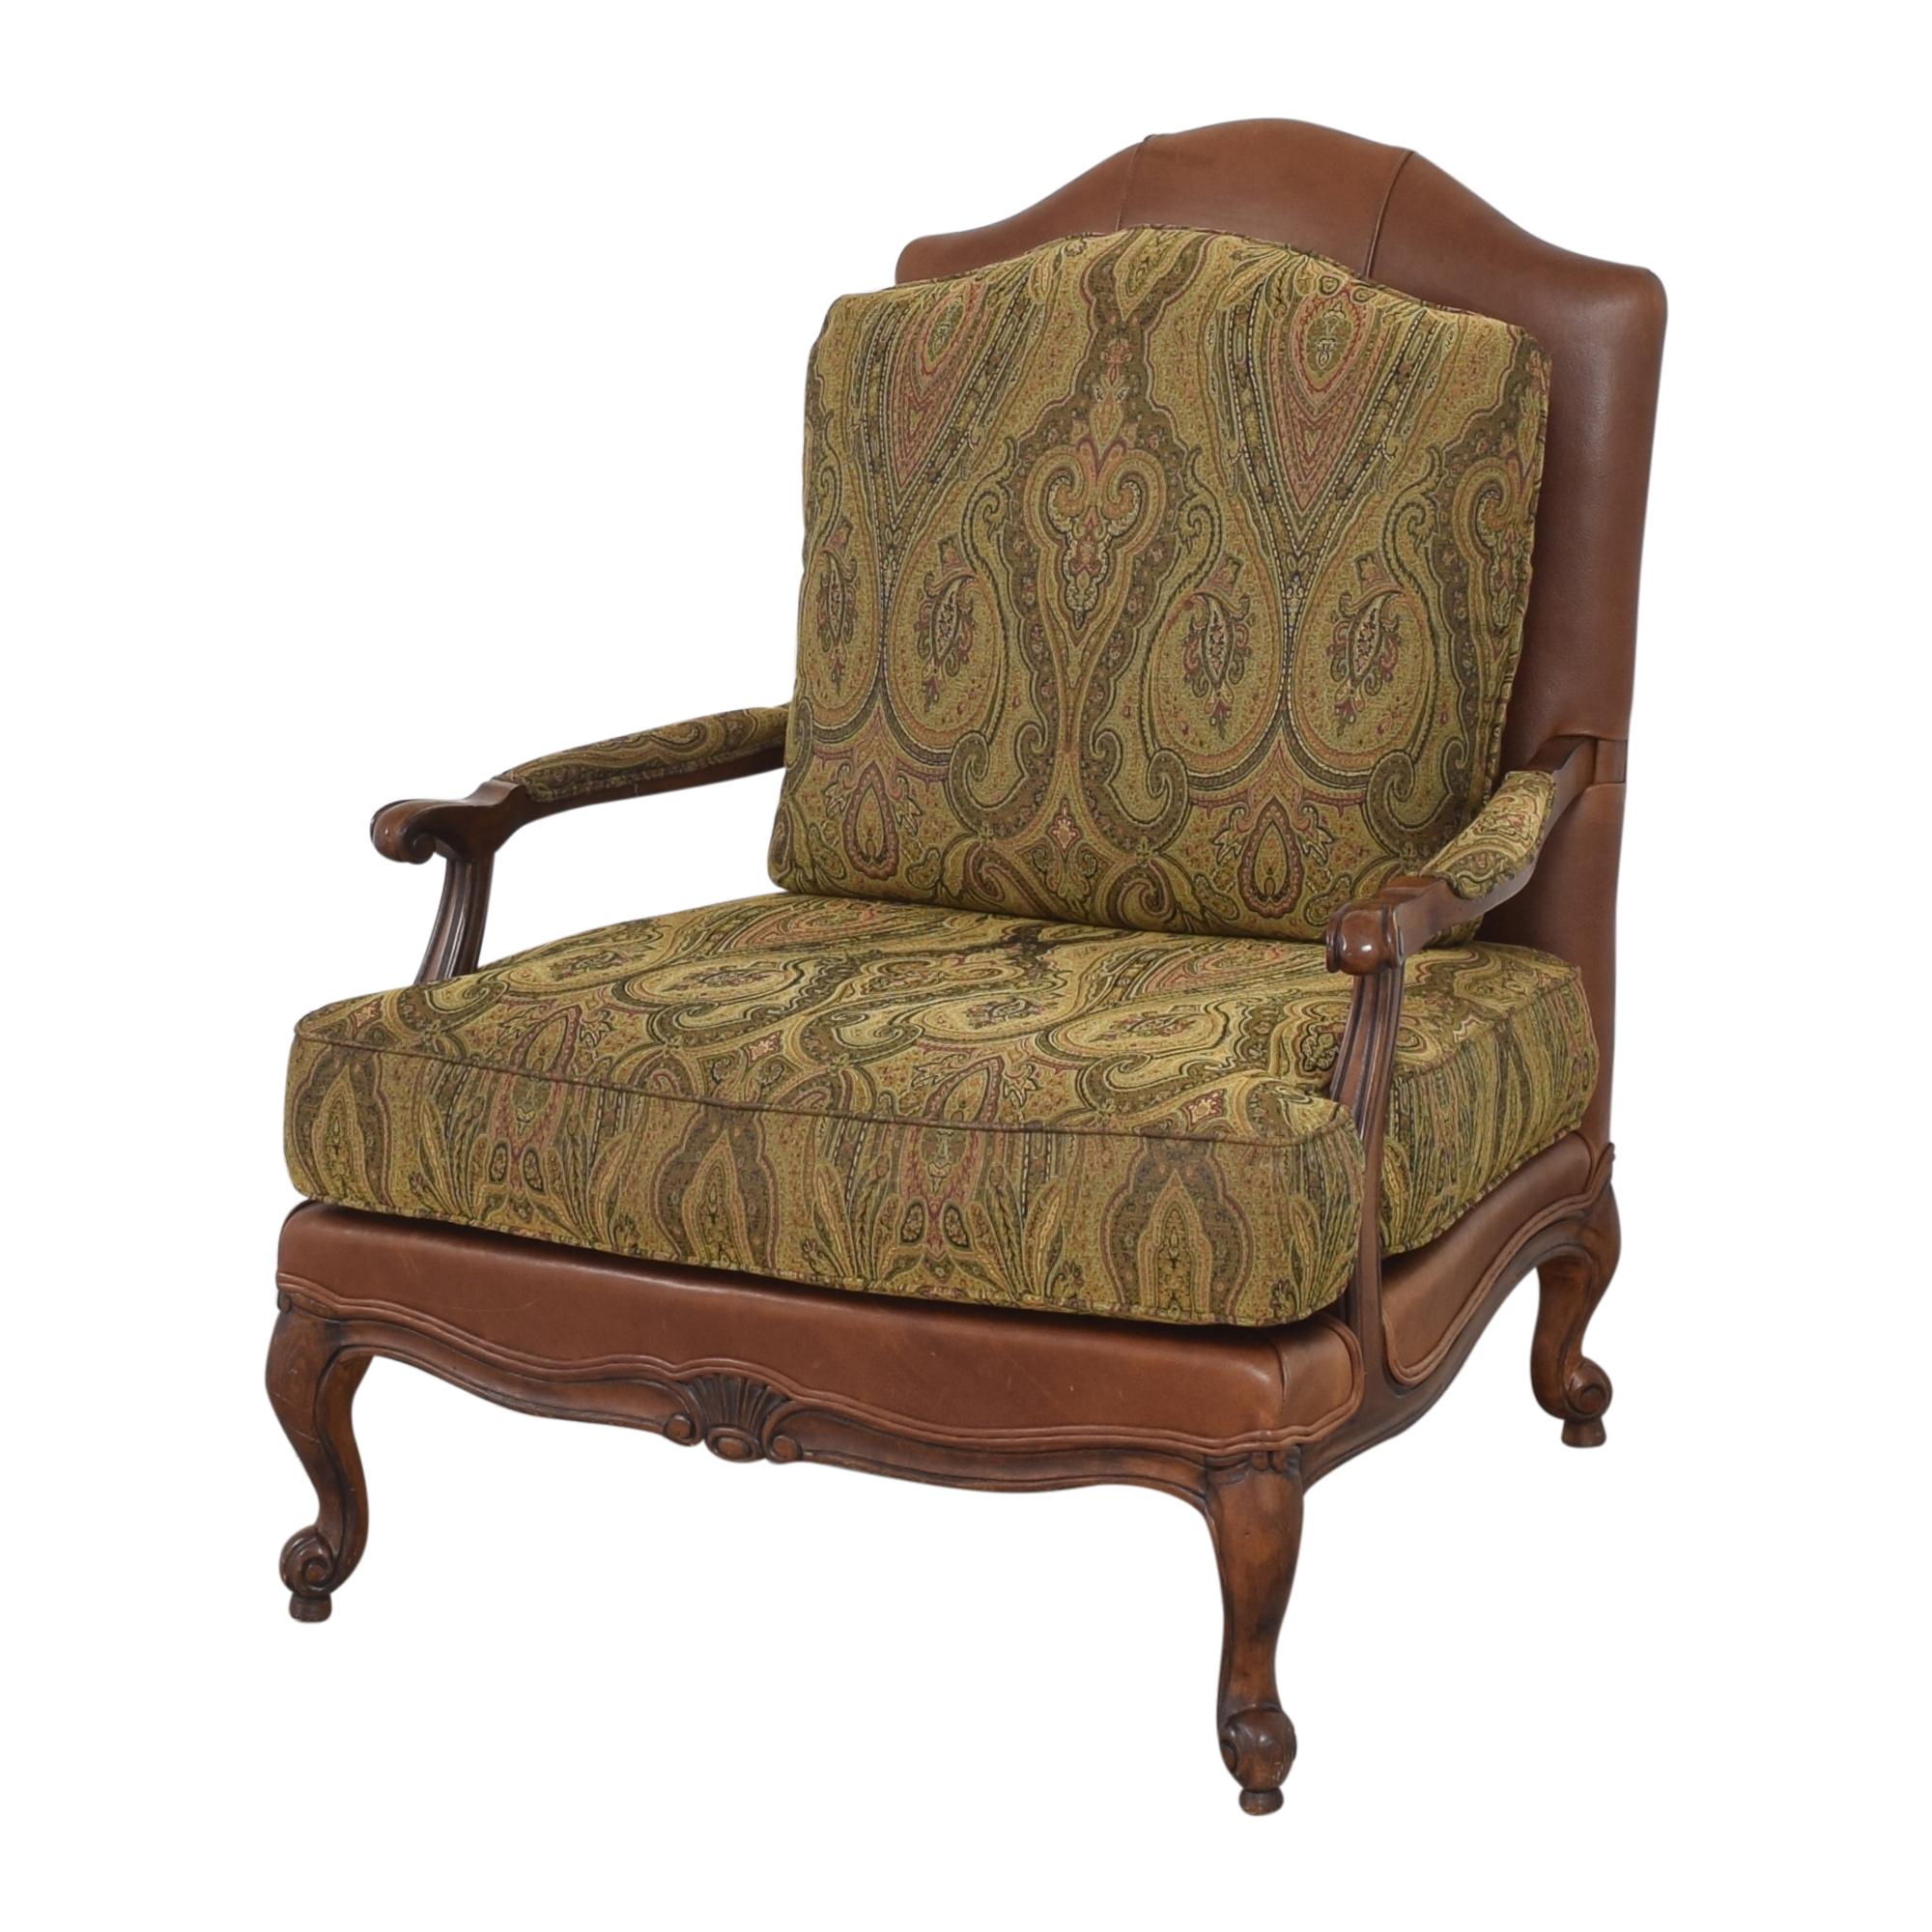 Ethan Allen Harris Chair / Accent Chairs